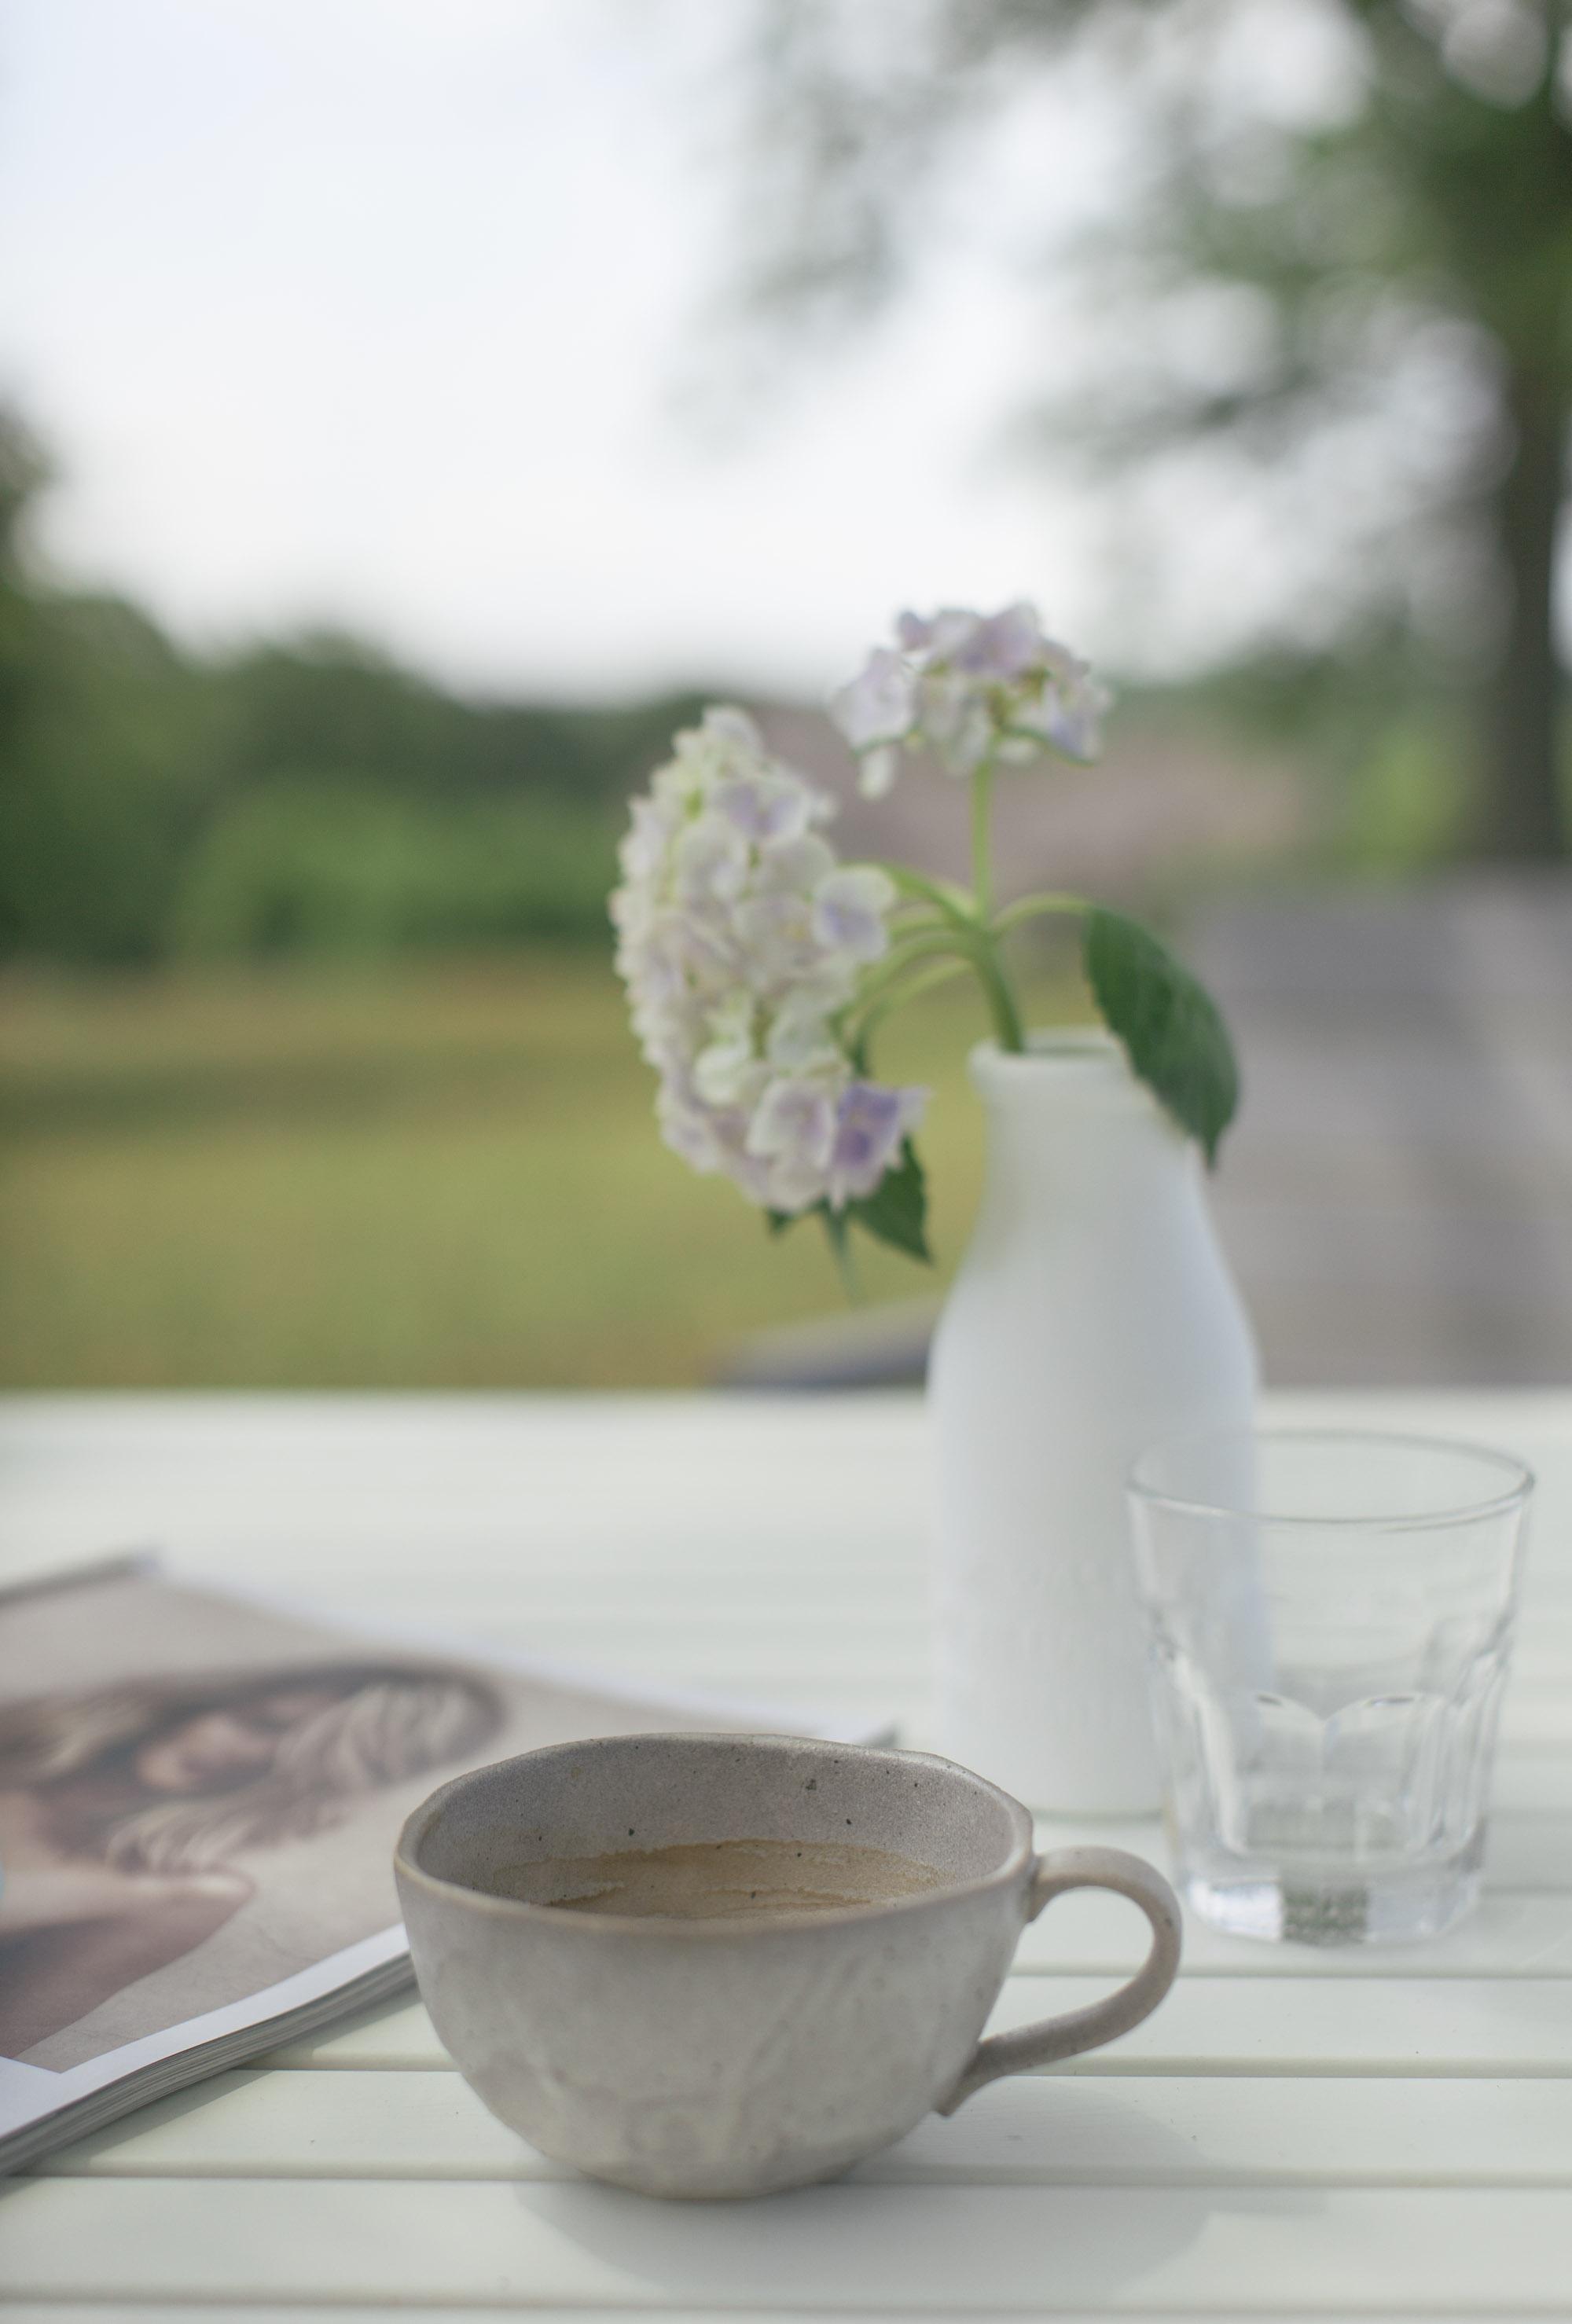 Mornings-5.jpg